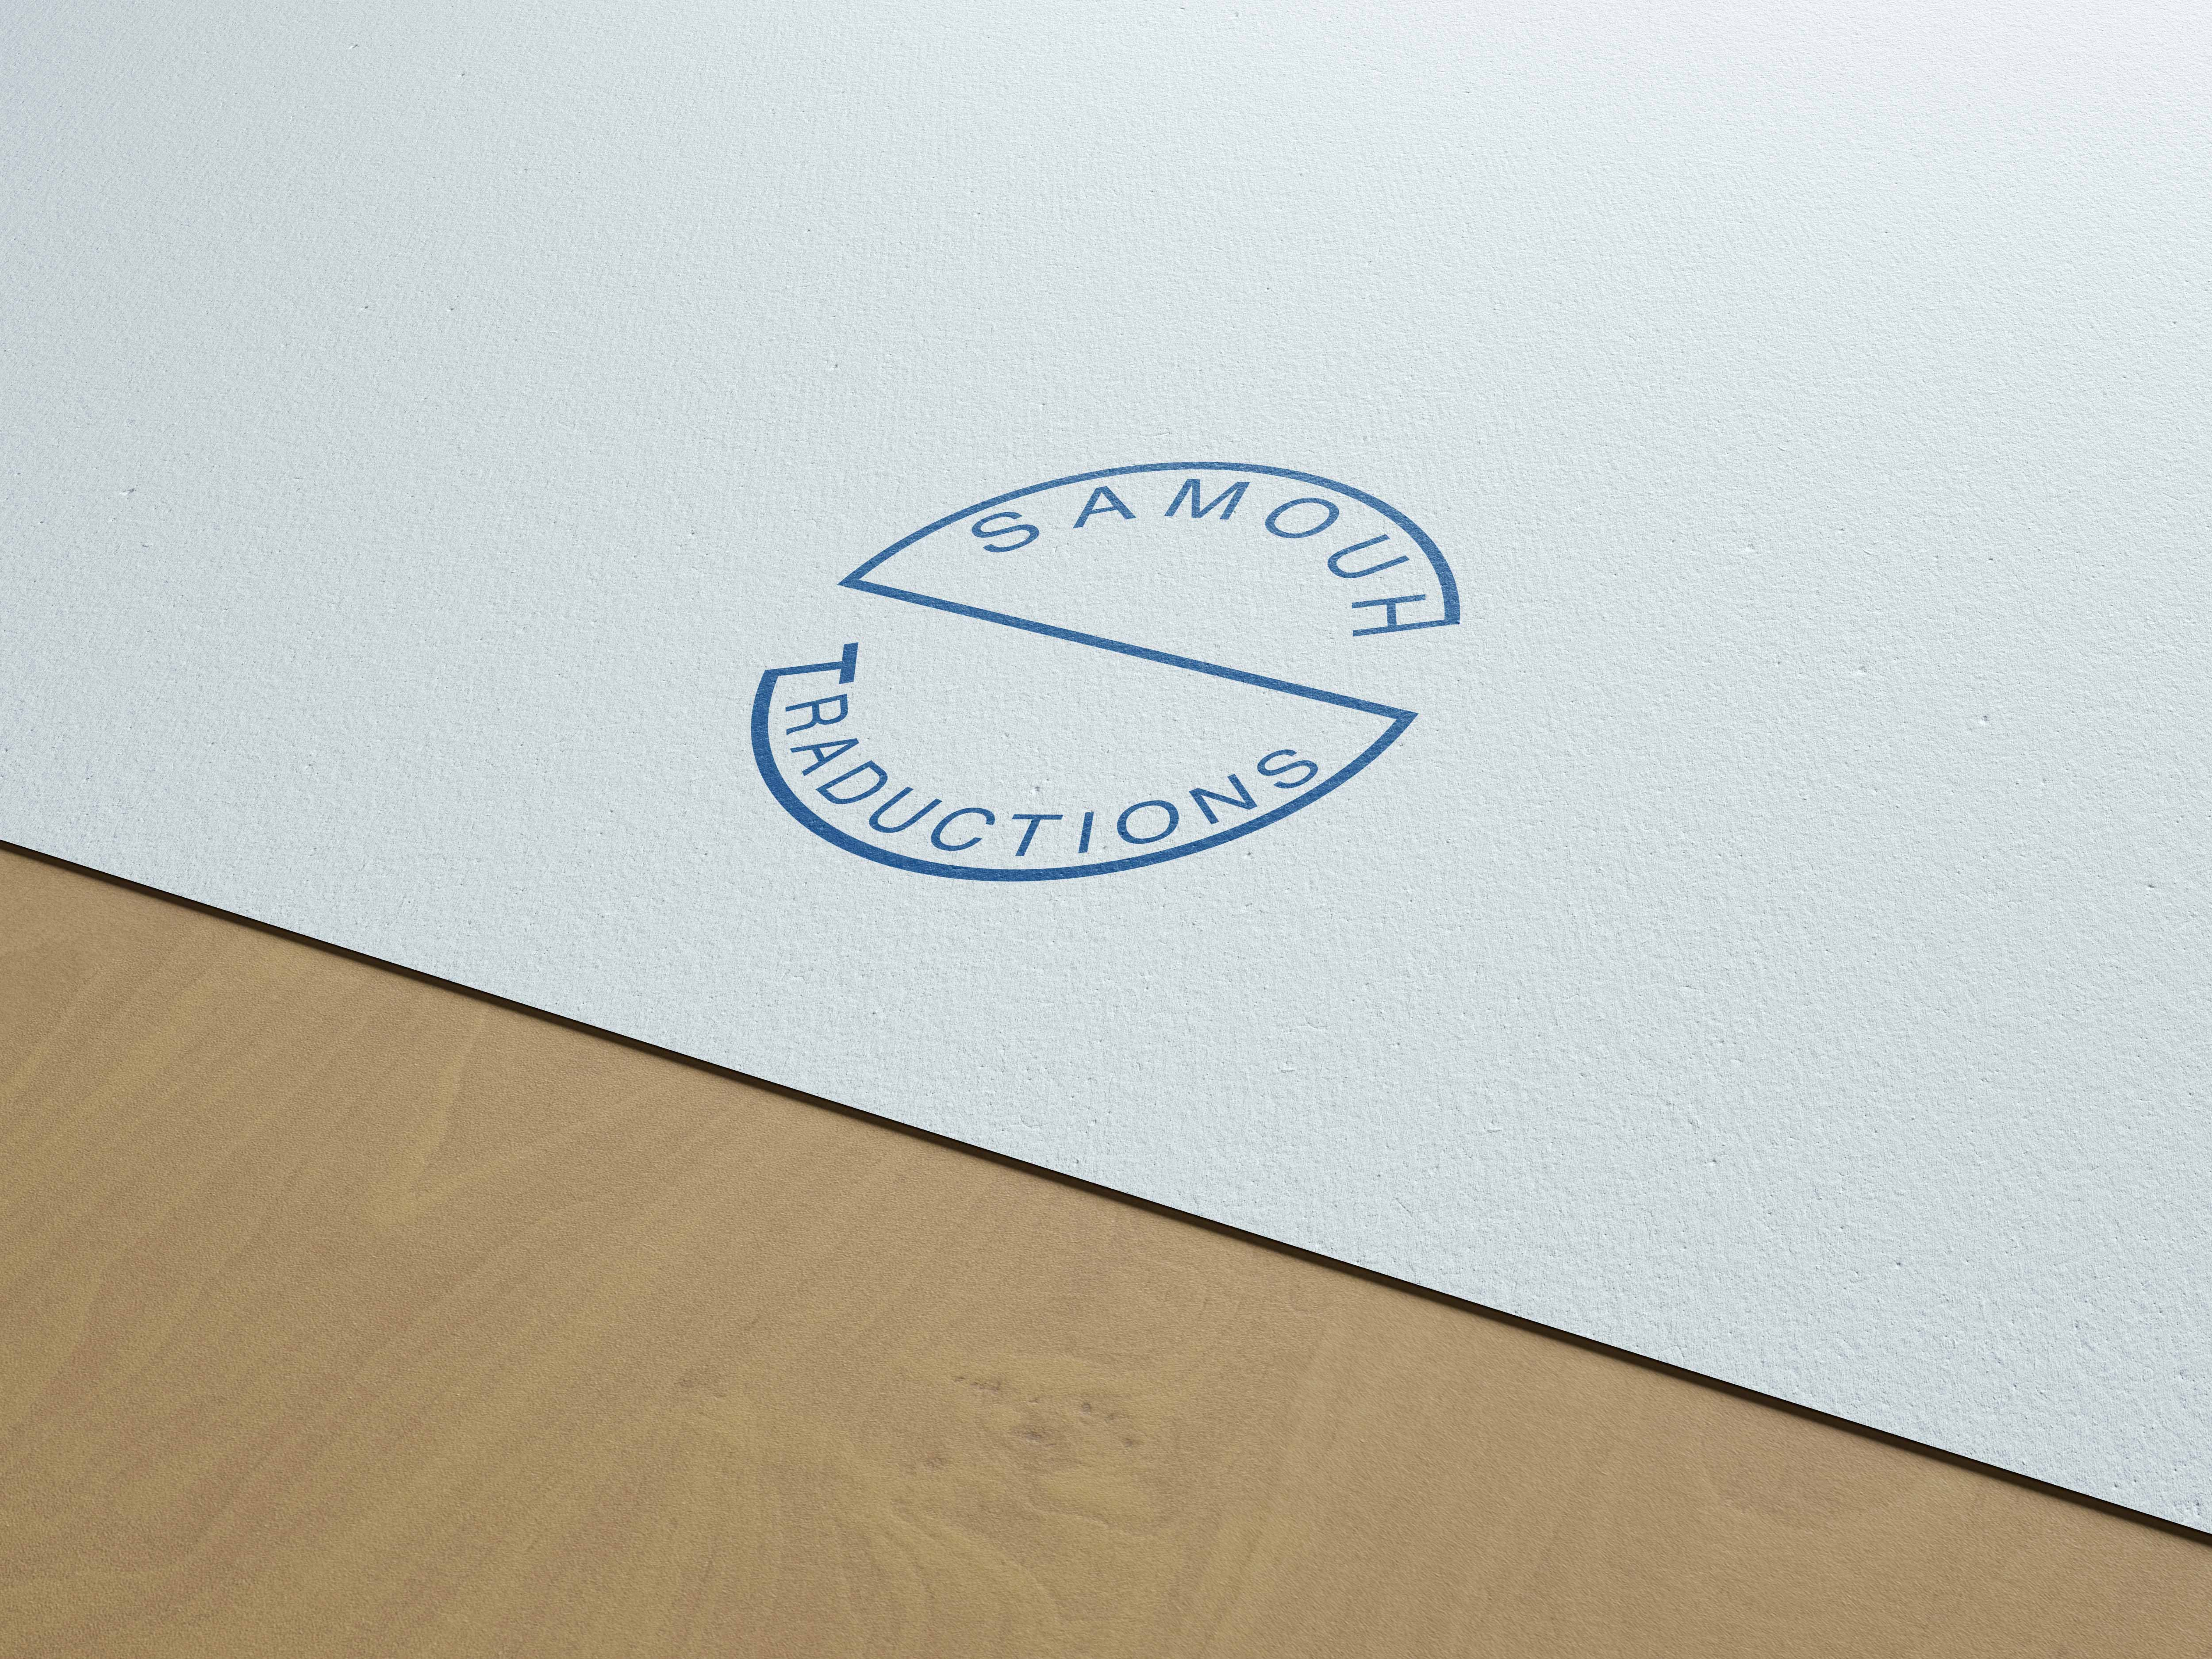 Mischler Webdesign Mannheim portfolio samouh tranductions logo